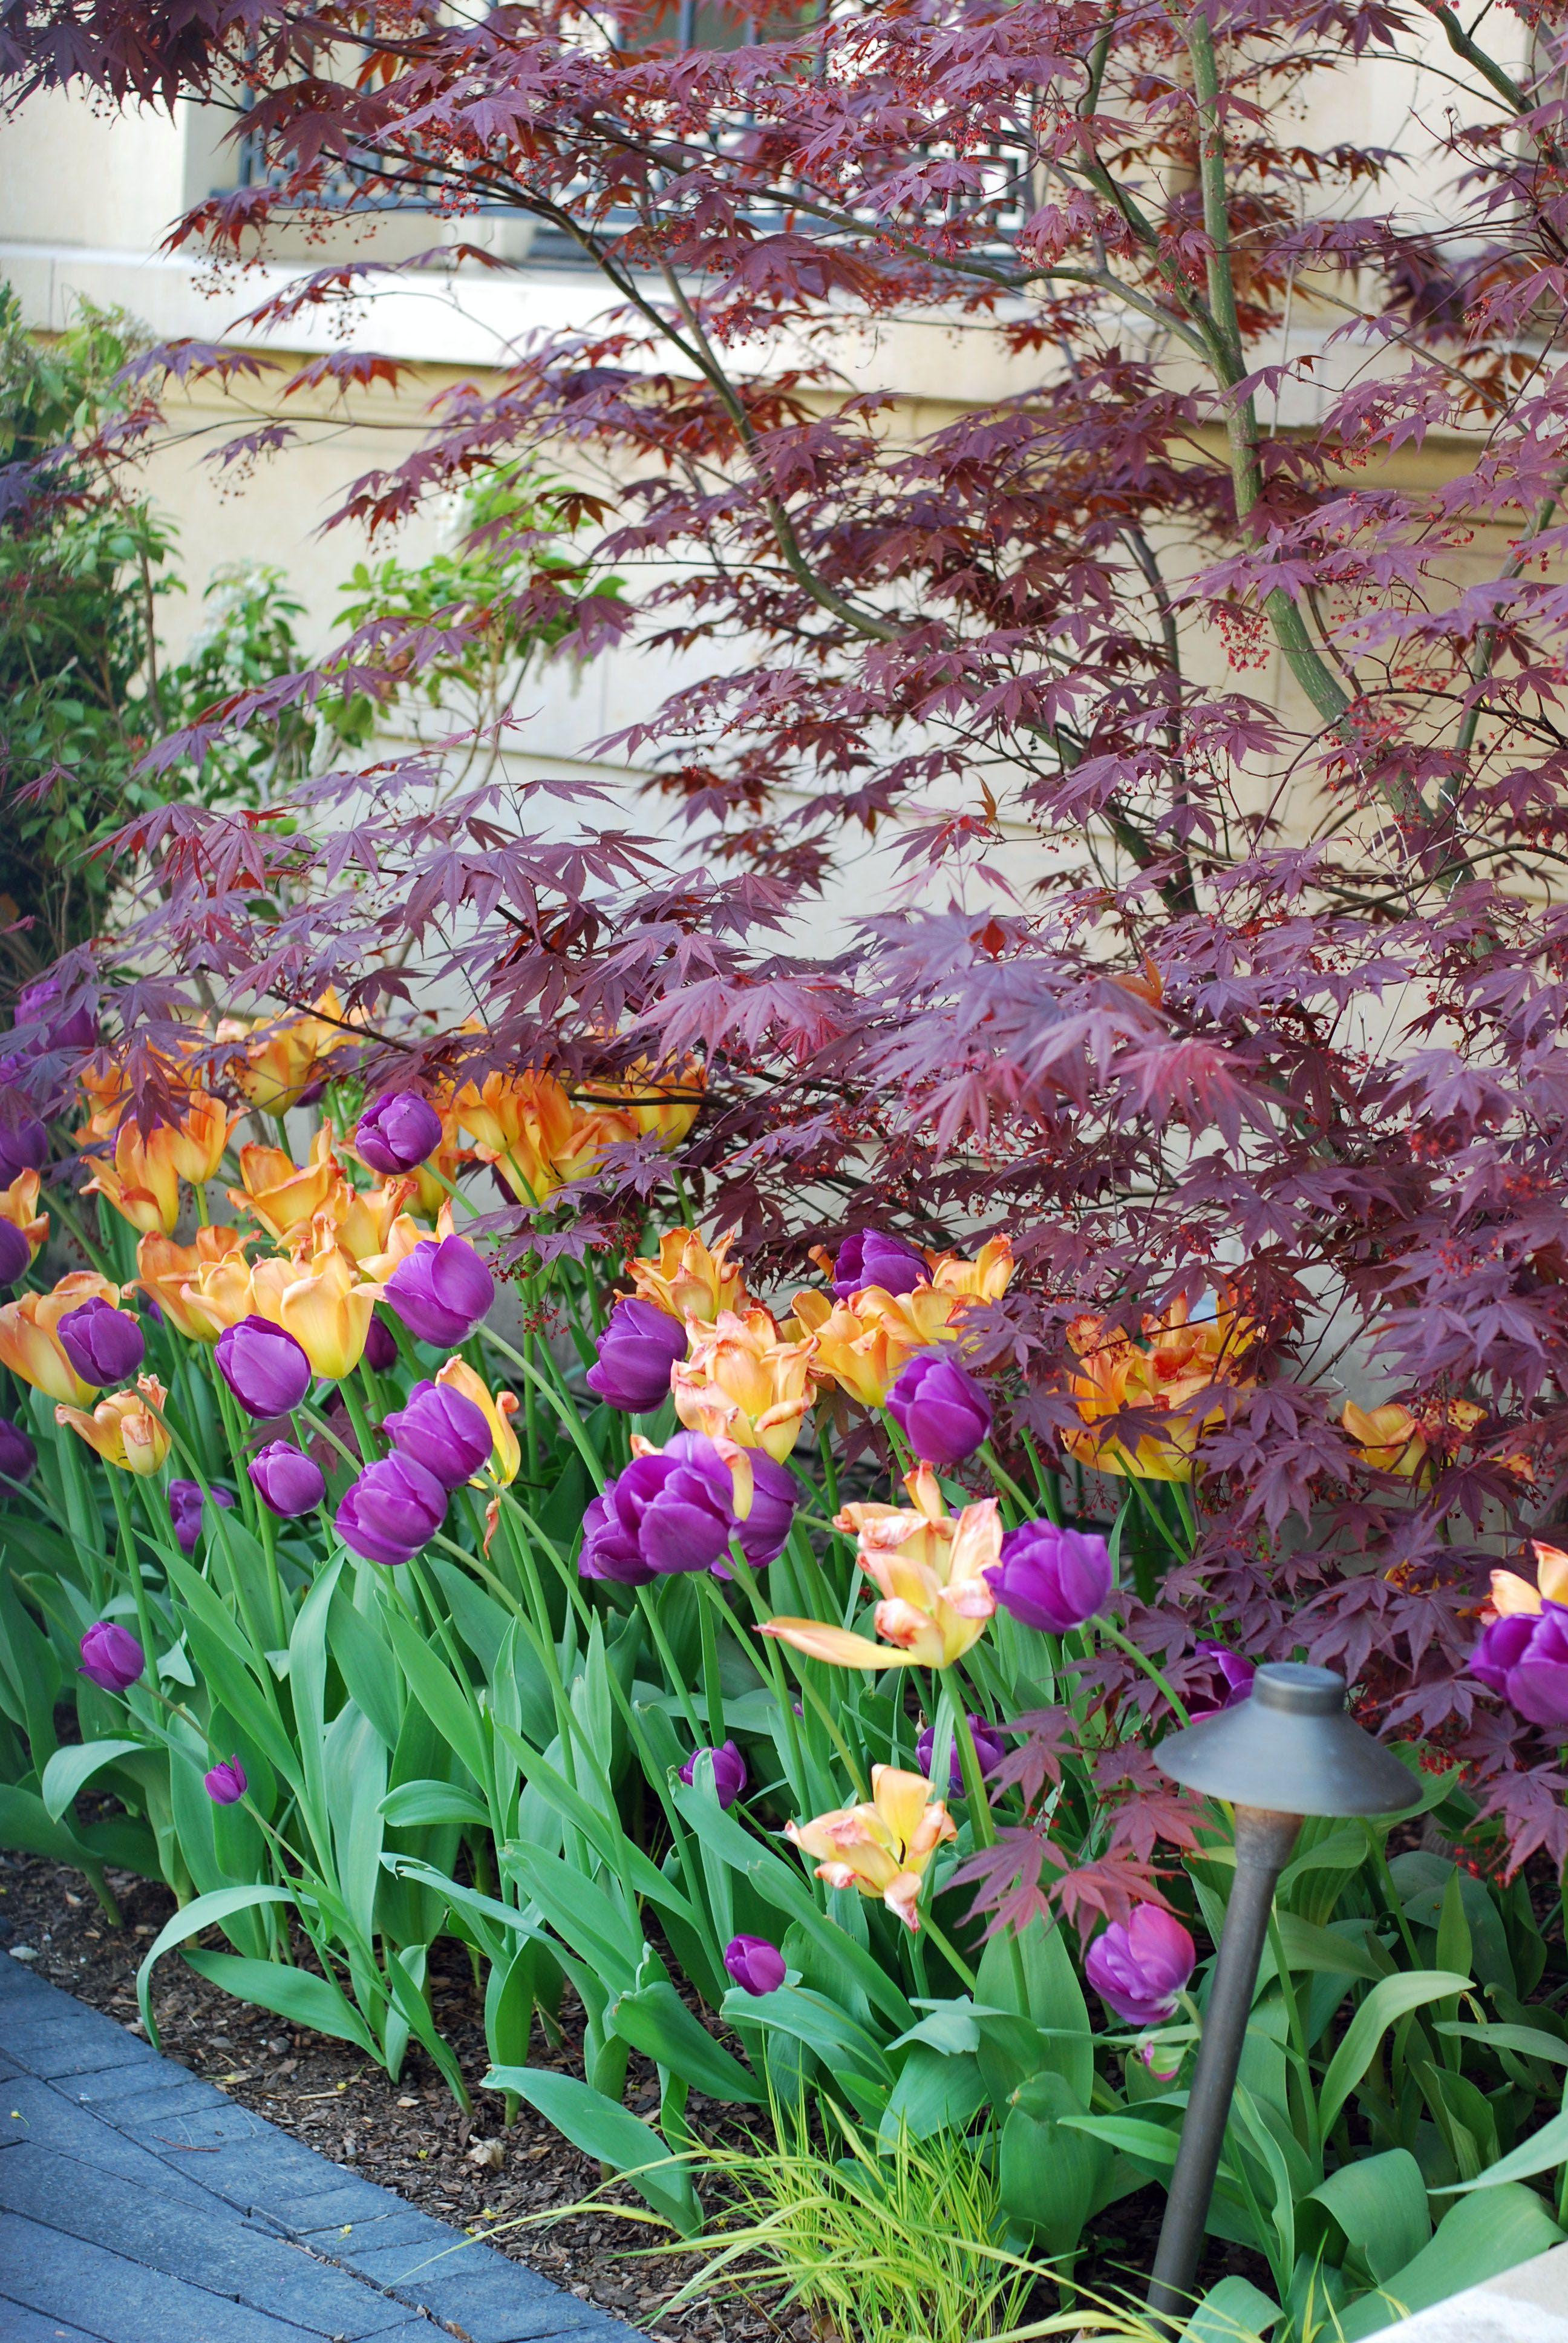 Tulip Bulbs Spring Annuals Flowers Urban Garden